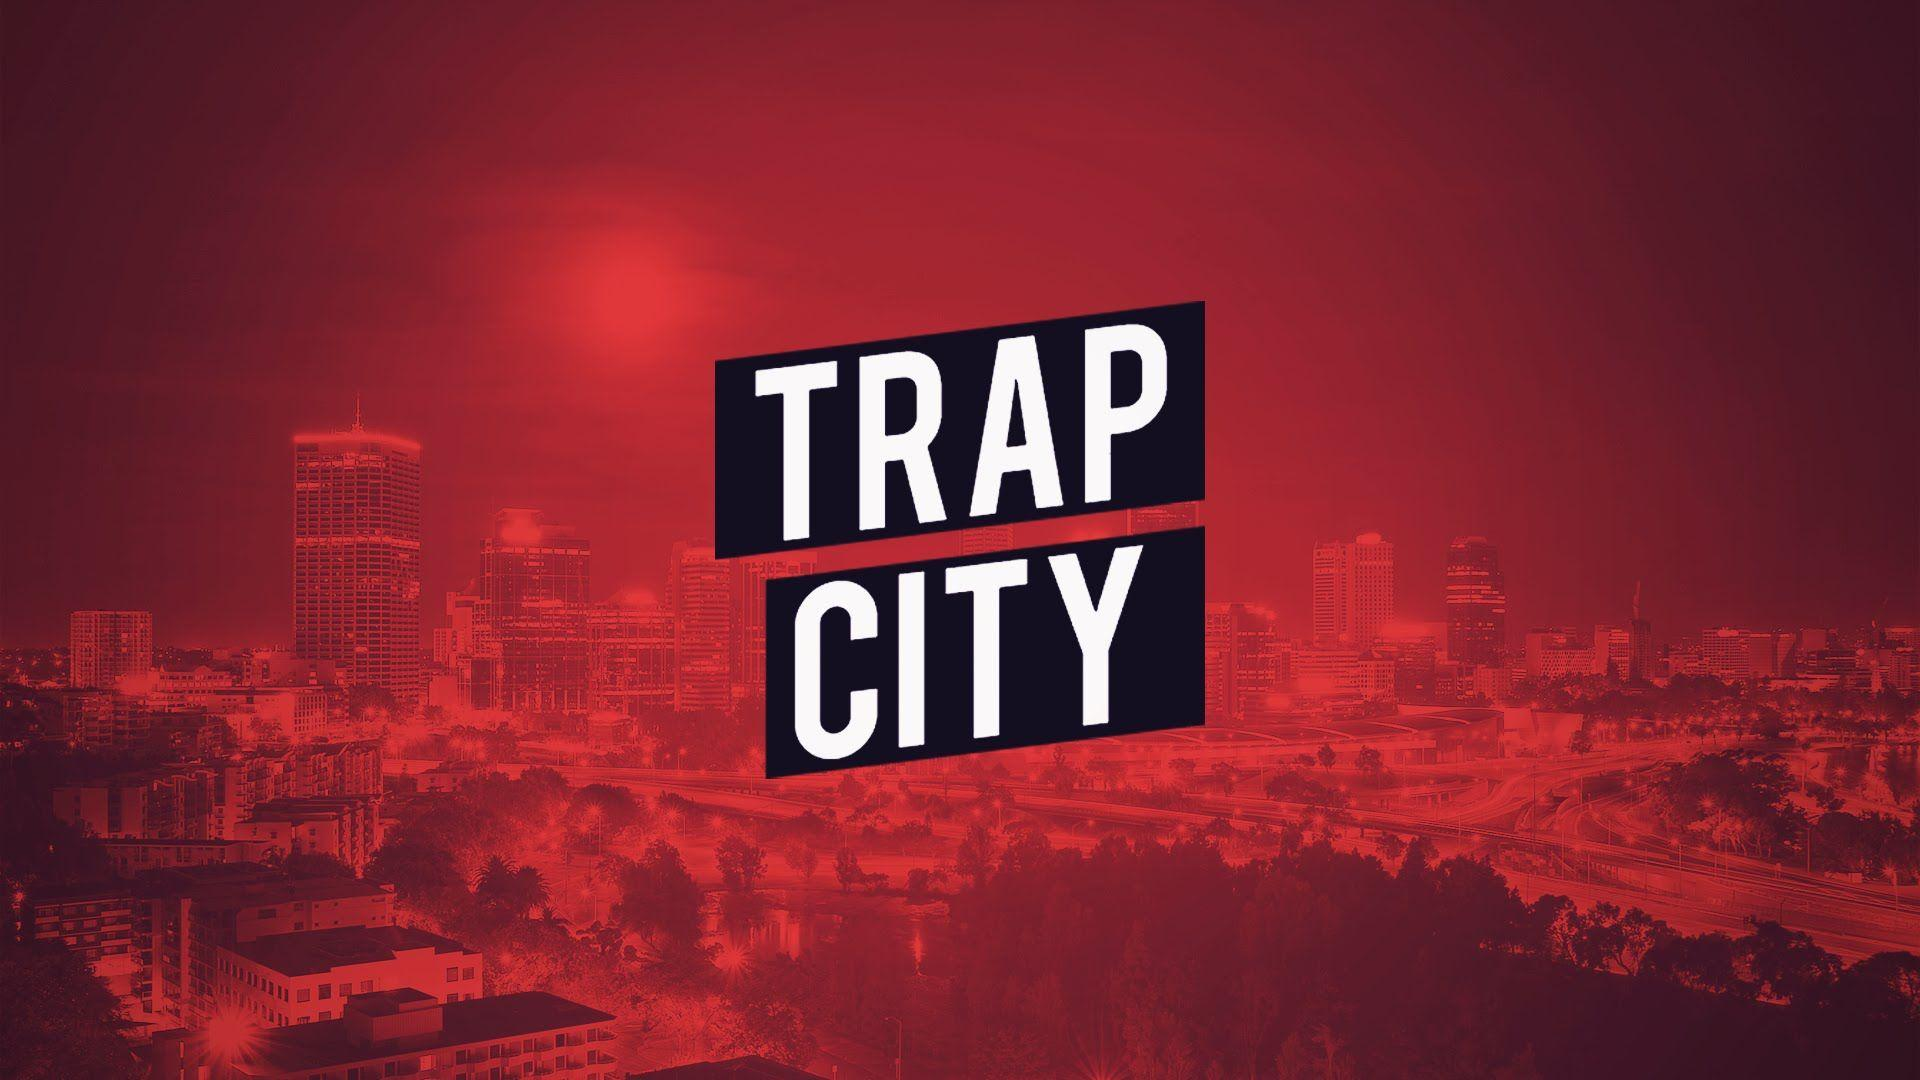 Trap City Wallpapers - Wallpaper Cave